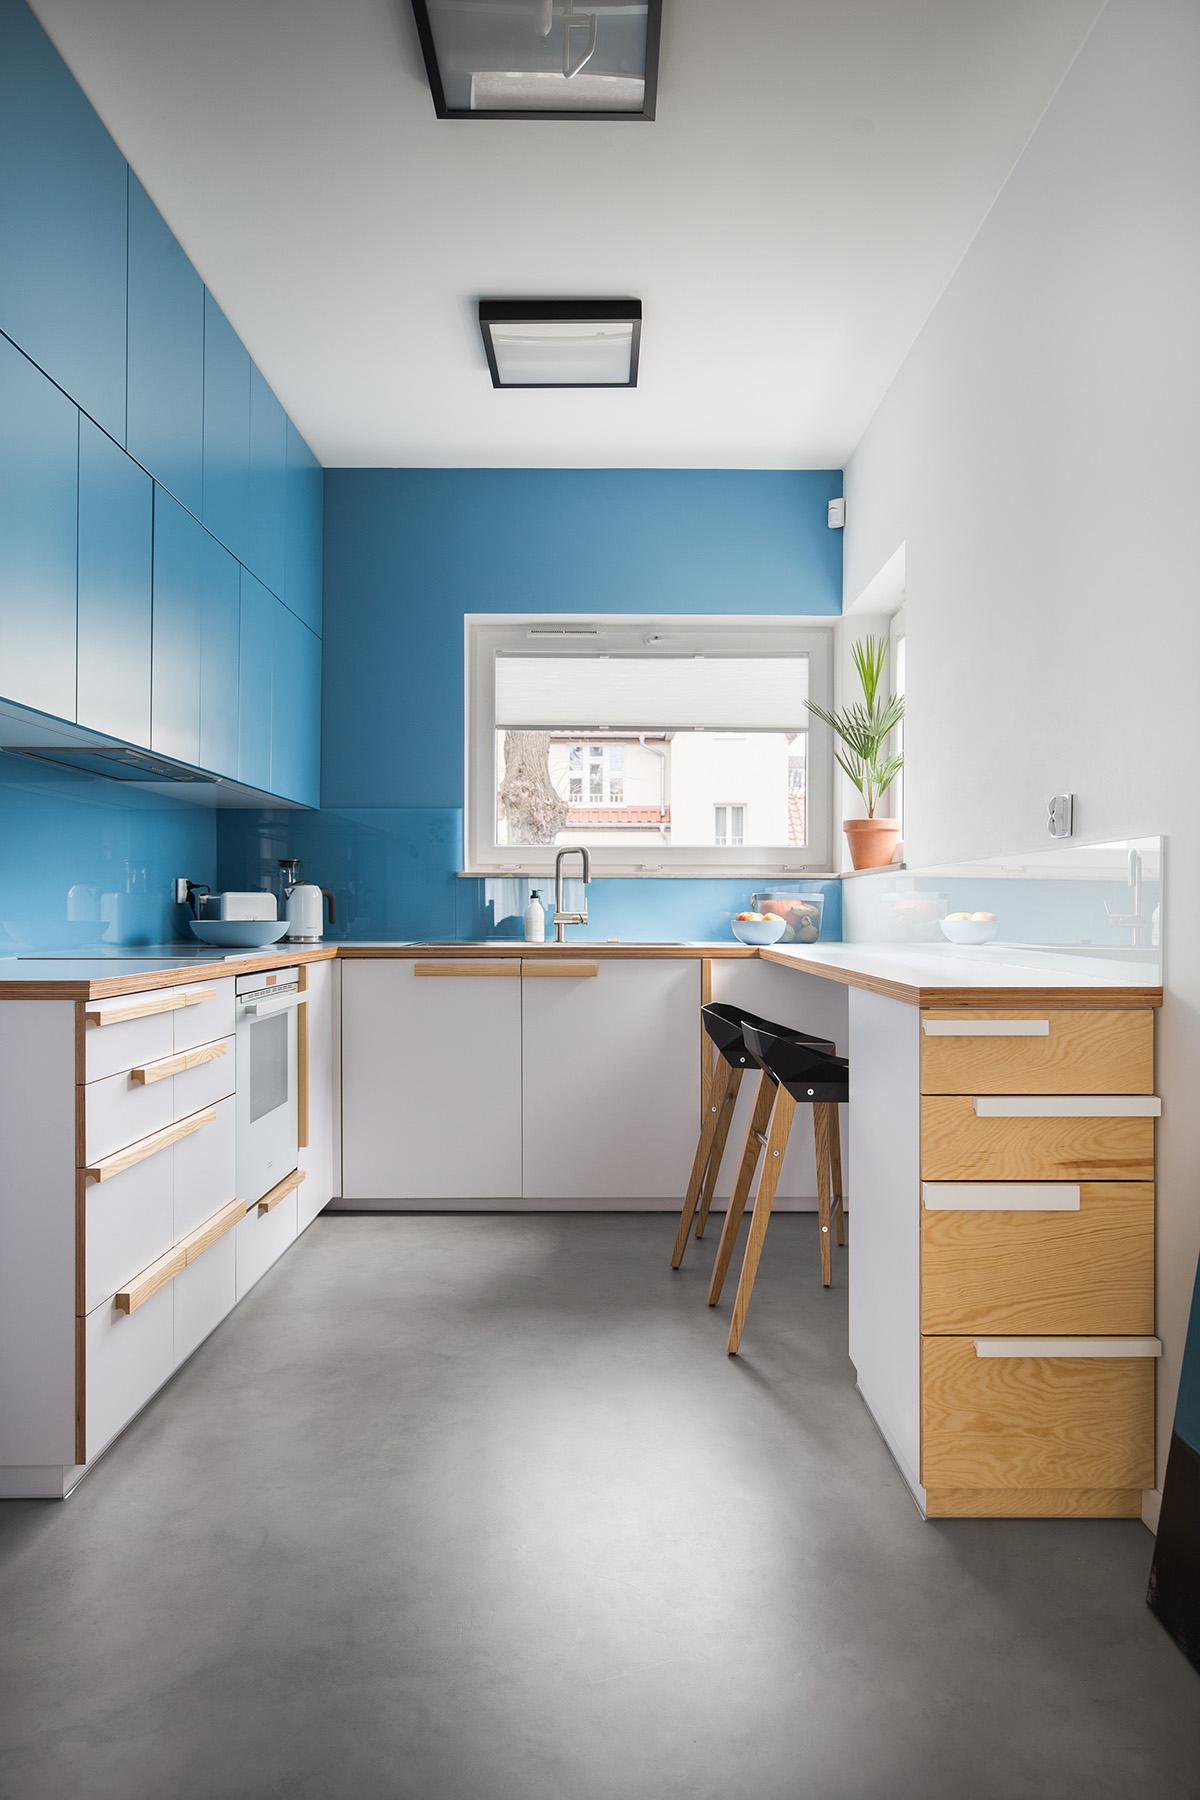 طراحی آشپزخانه مدرن 15